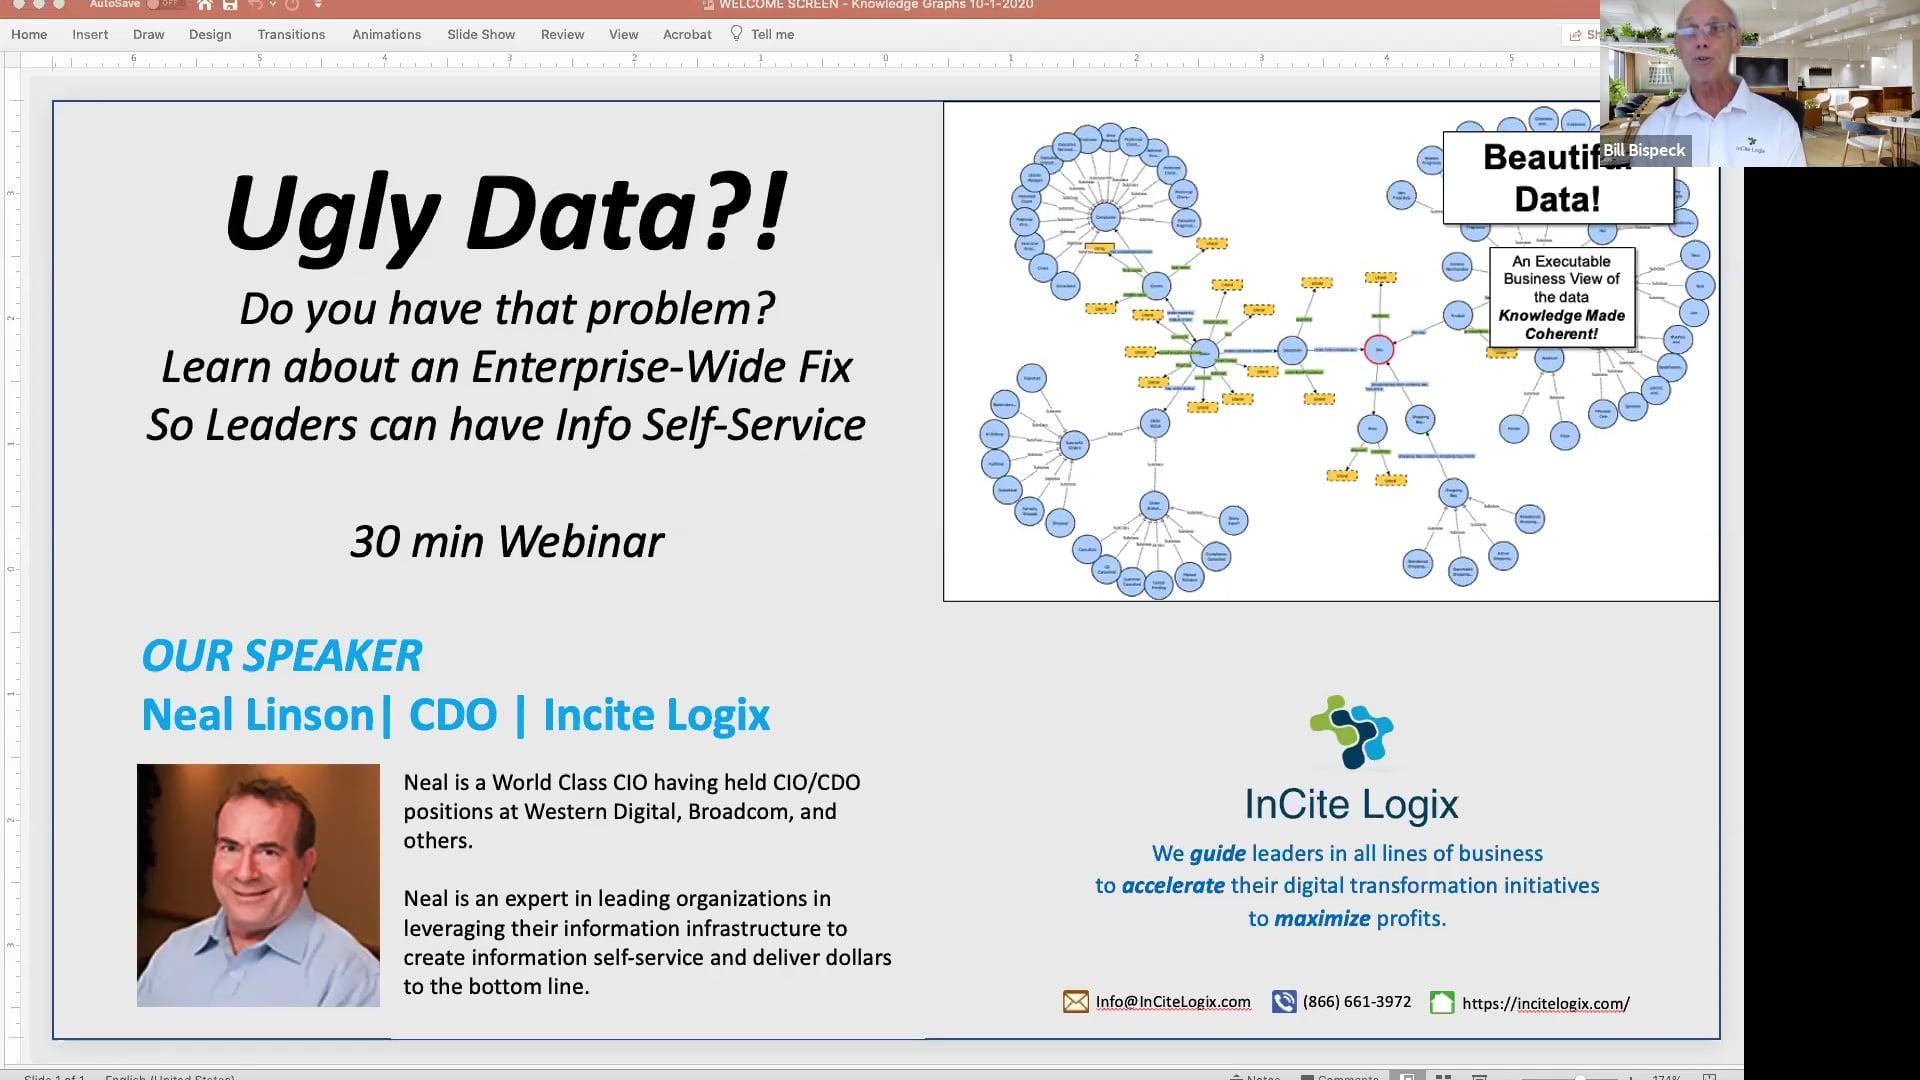 Webinar - 30 min - Ugly Data?! - See An Enterprise-Wide Fix